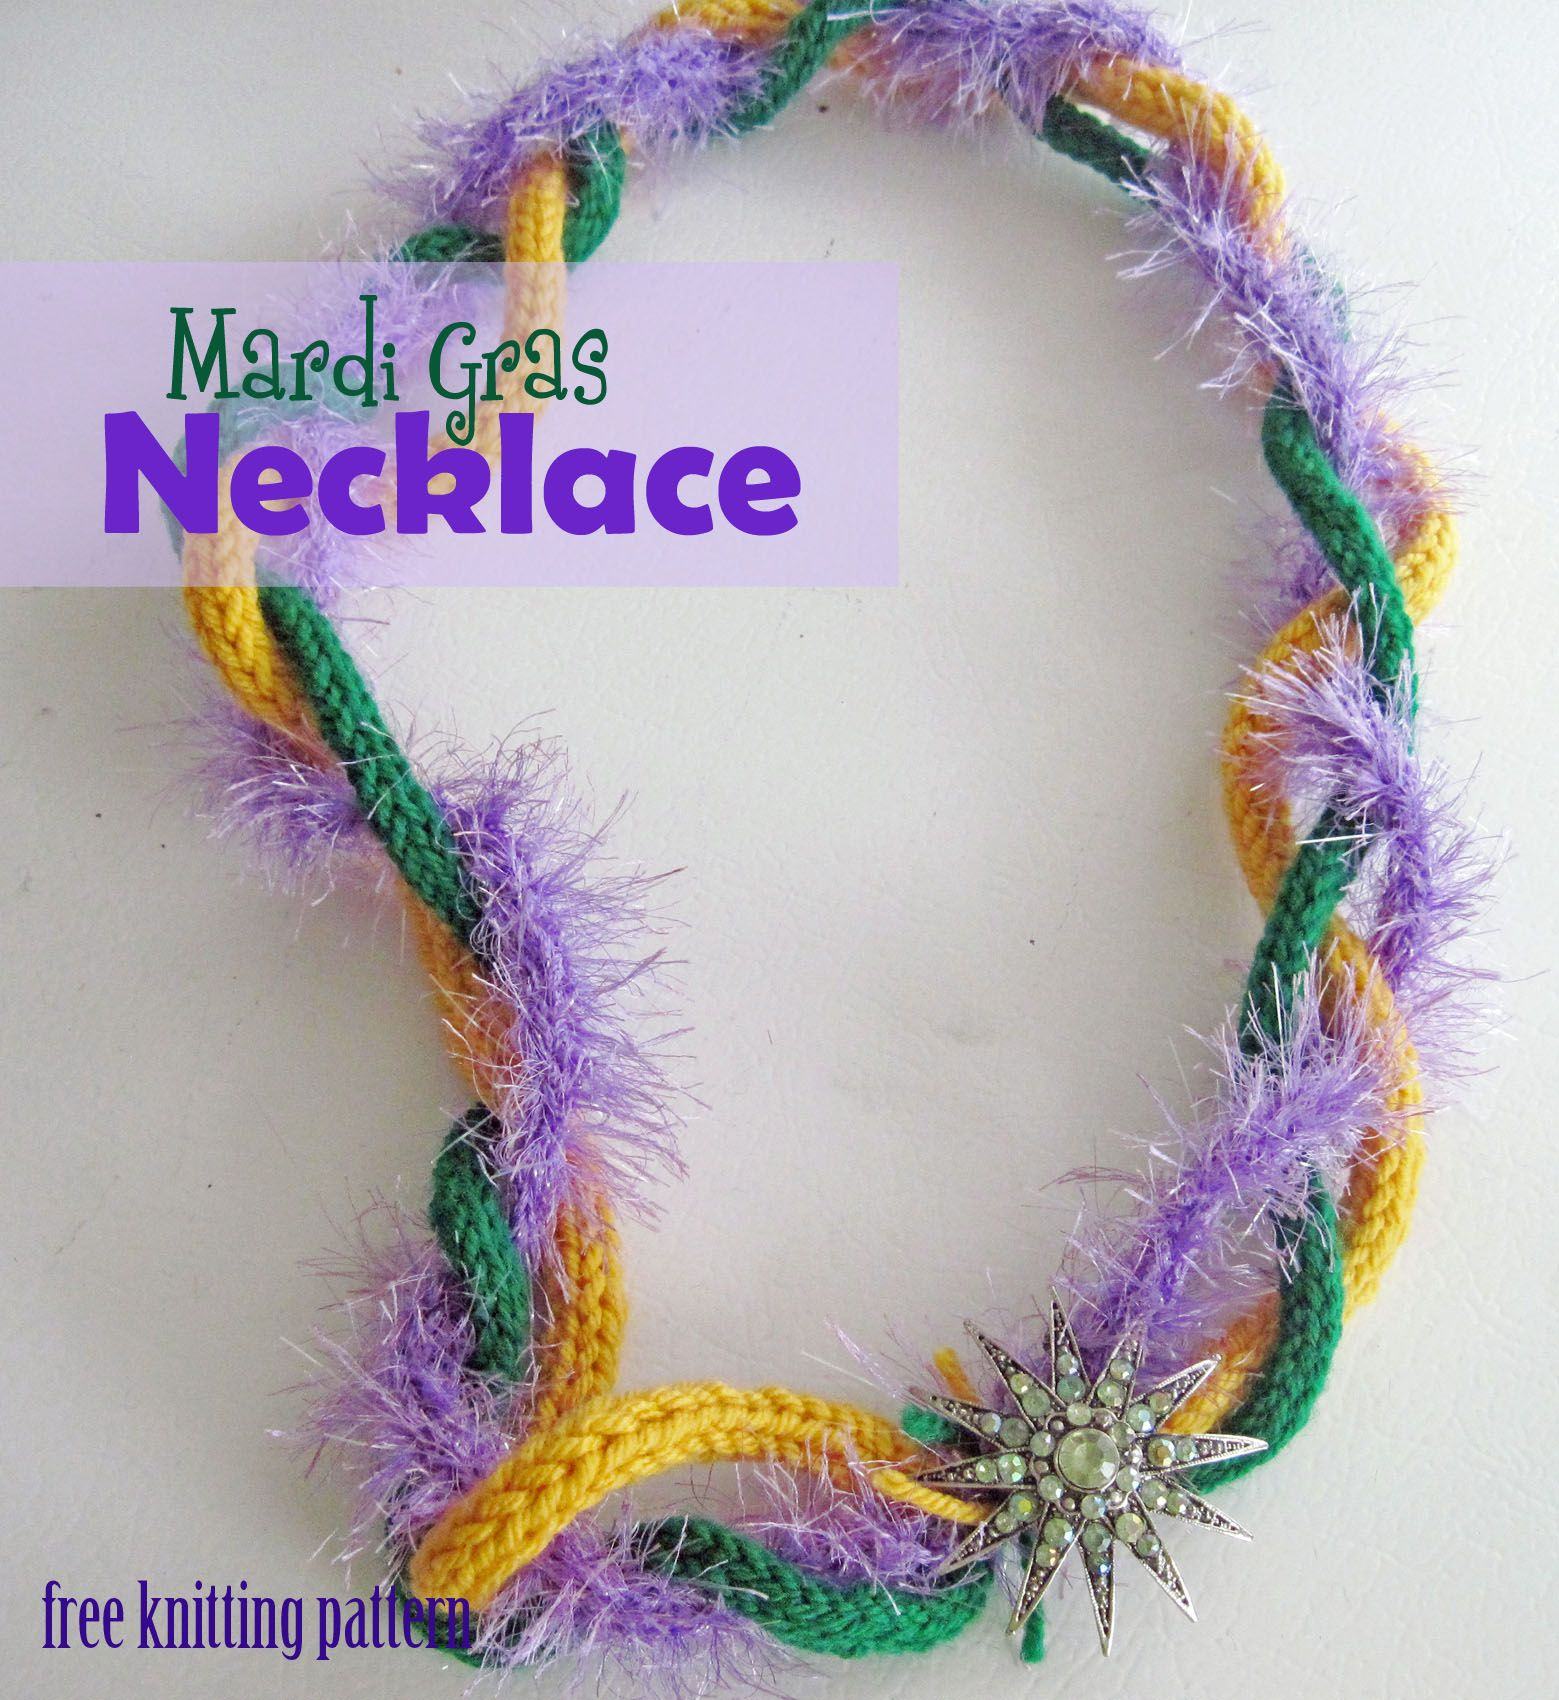 Free Knitting Pattern - Mardi Gras Necklace | Crochet/knit jewelry ...